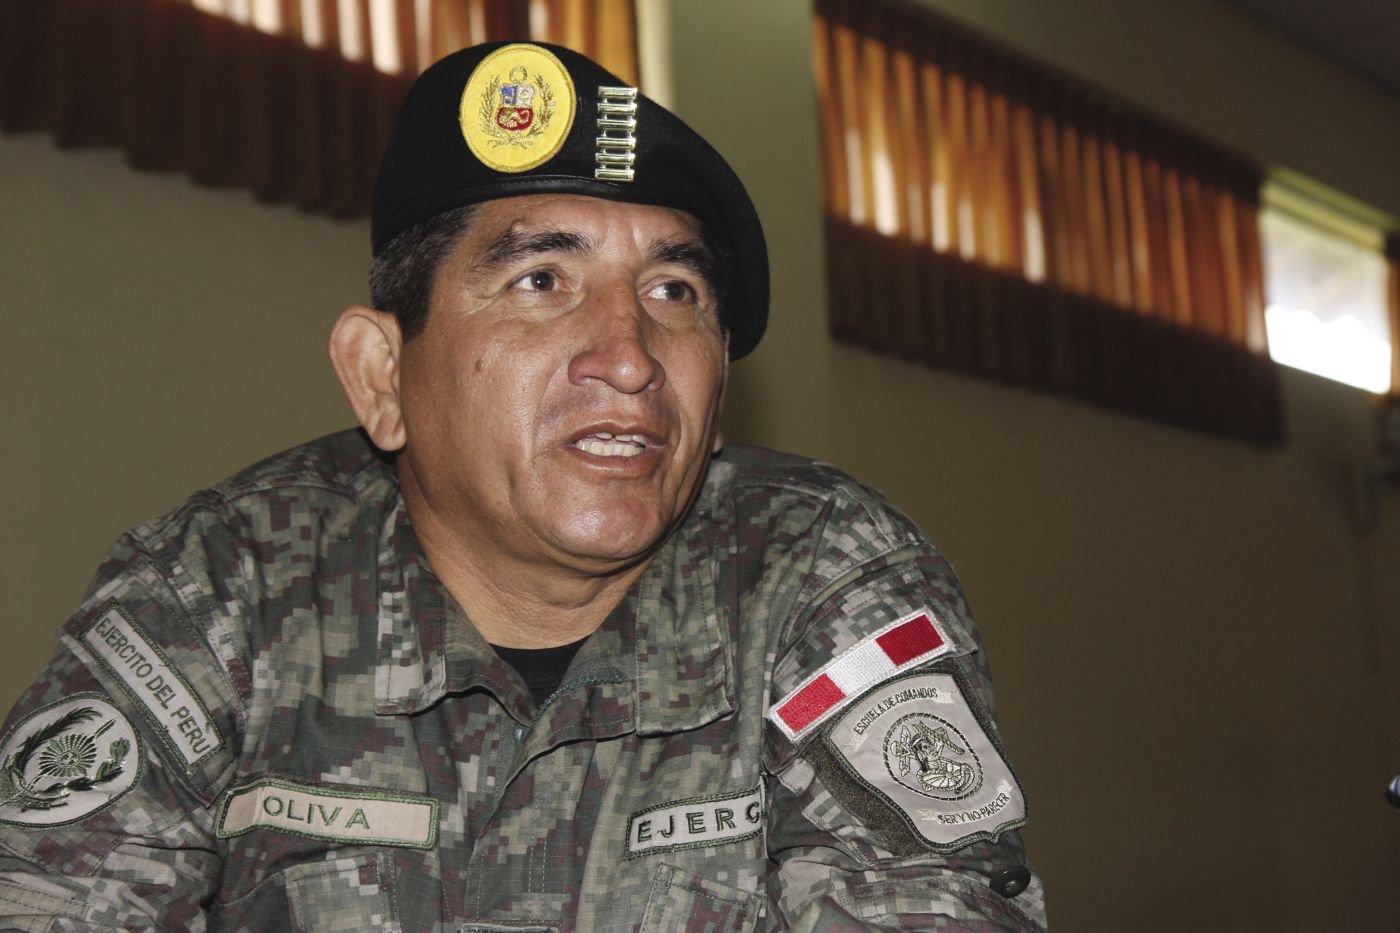 Peru's Commando School